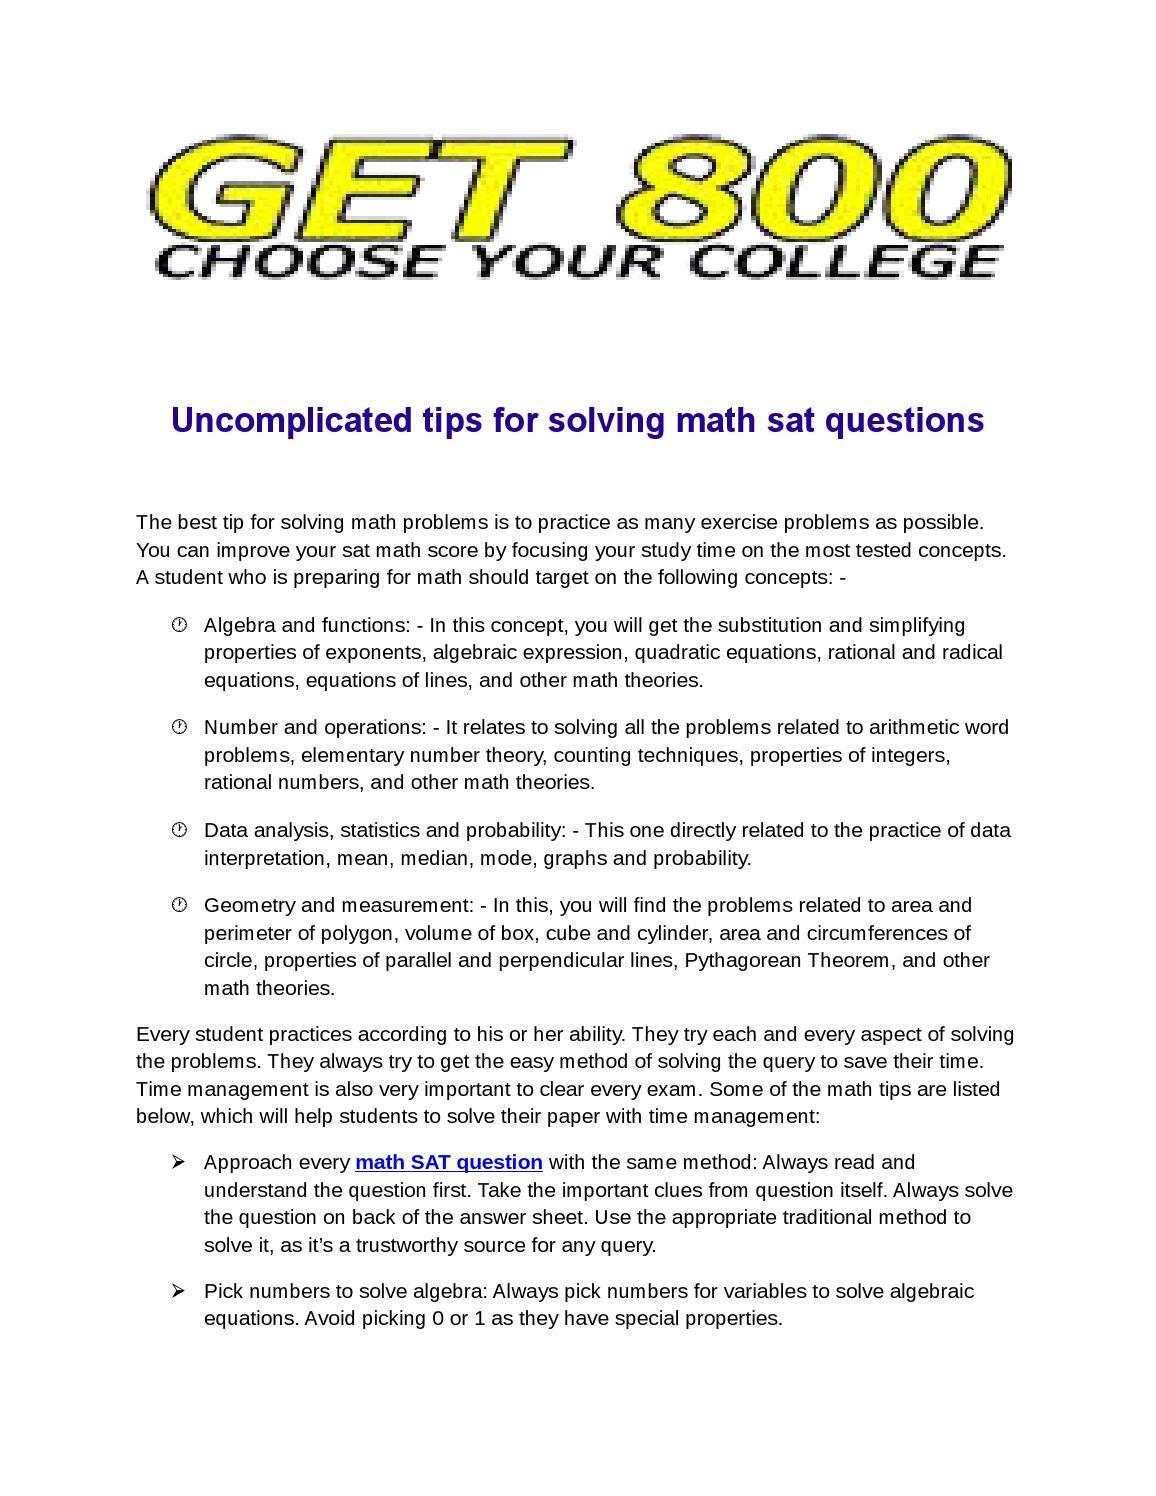 Math sat questions by Sat Prep - issuu